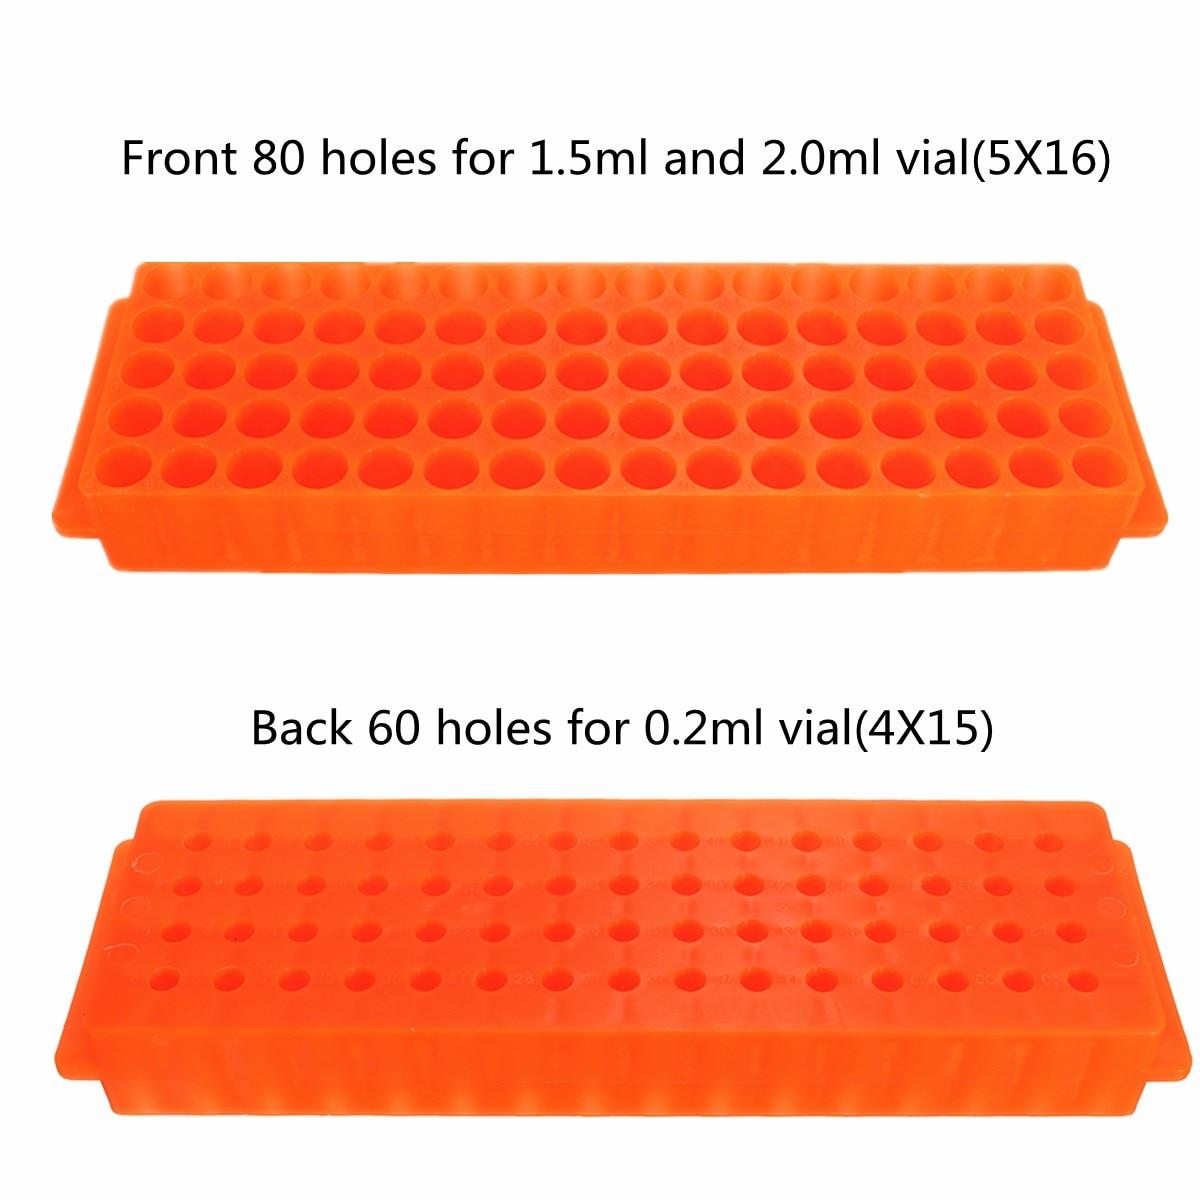 2 Side 60/80 Hole Plastic Test Tube Rack Laboratory Test Tubes Holder Stand Bracket Rack 0.2ml/1.5ml/2ml Micro Centrifuge